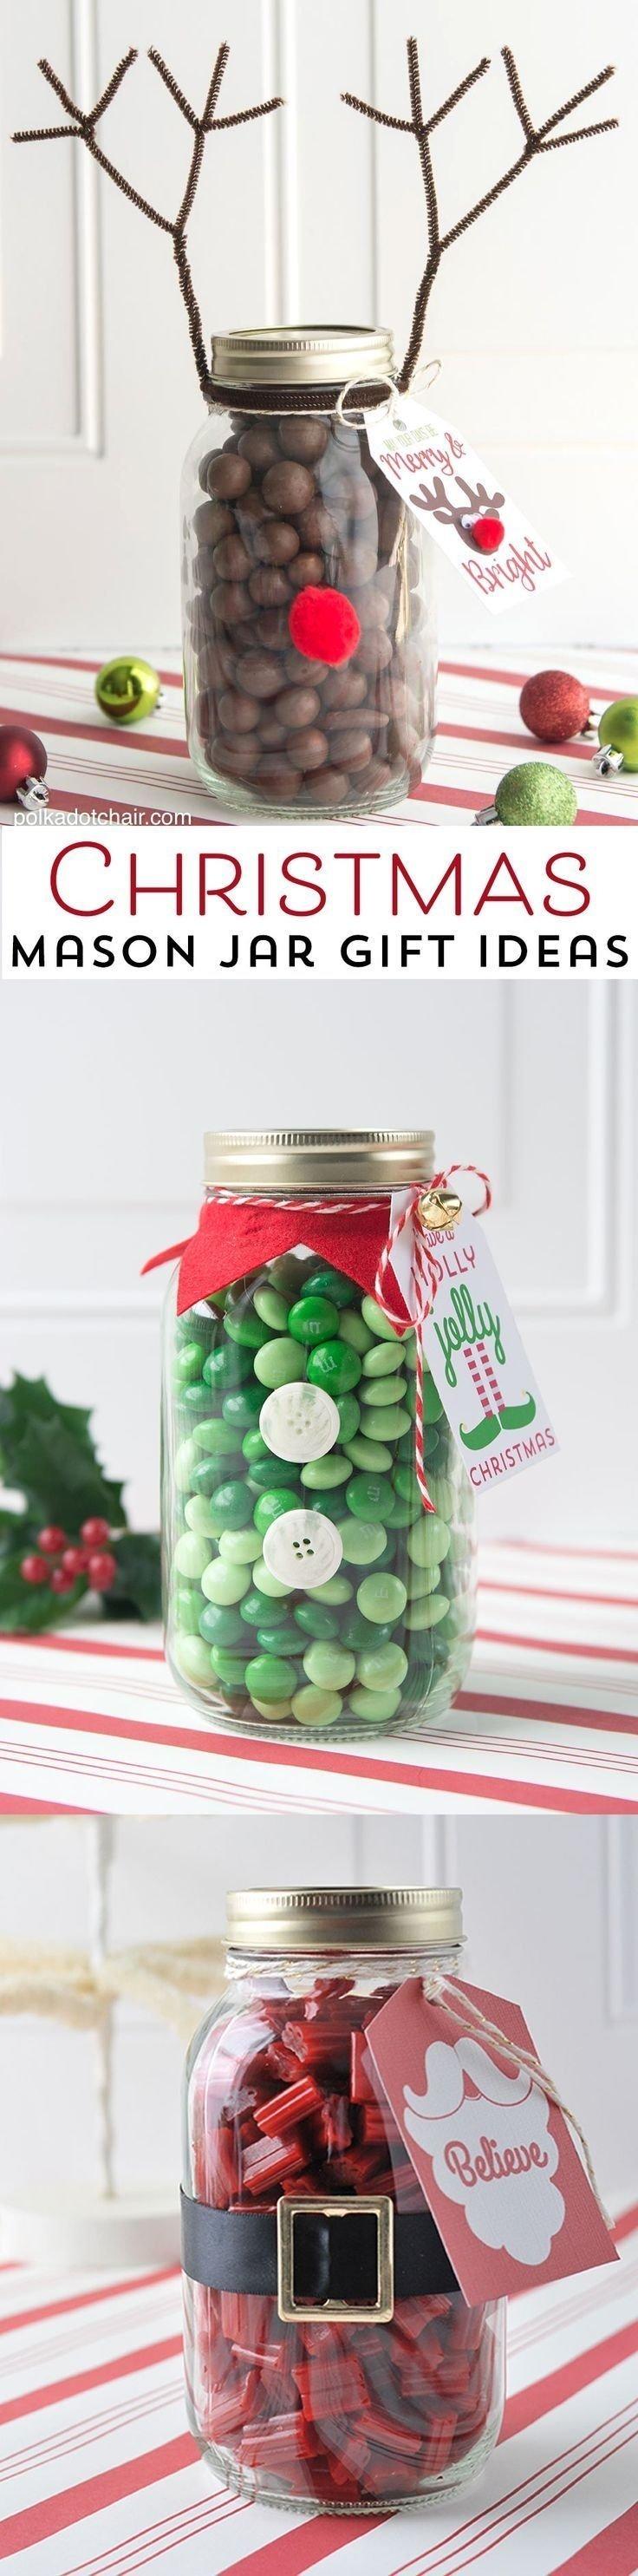 Imágenes de Cute Homemade Christmas Gifts